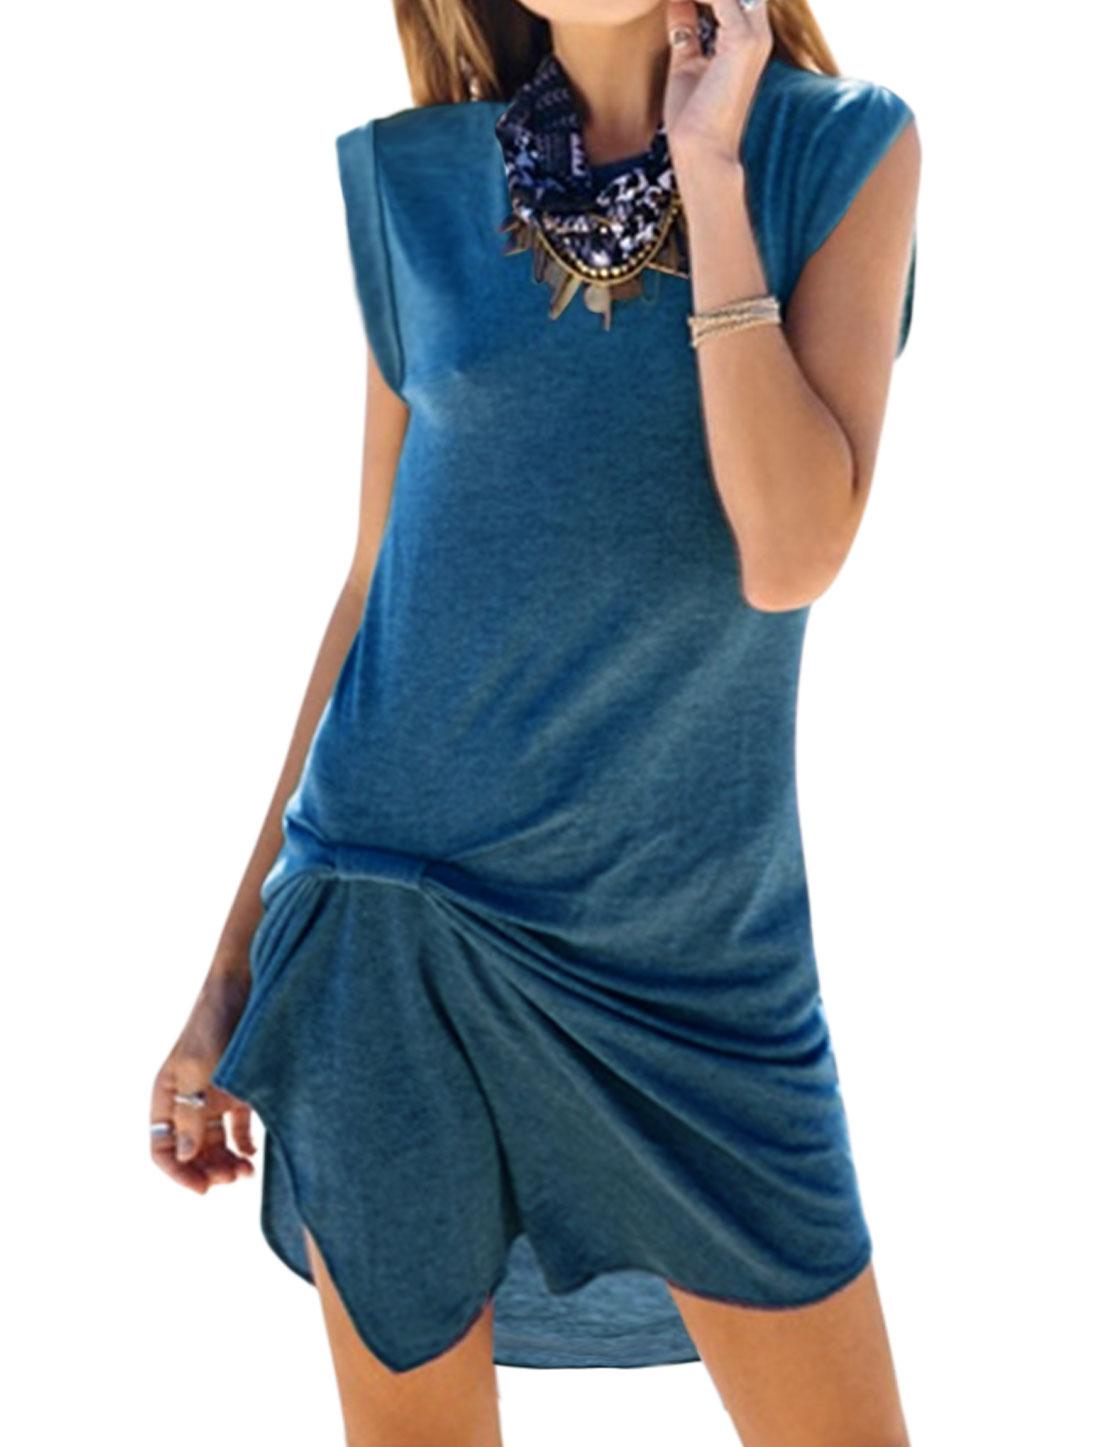 Women Crew Neck Knot Design Asymmetric Hem Tunic Top Blue M